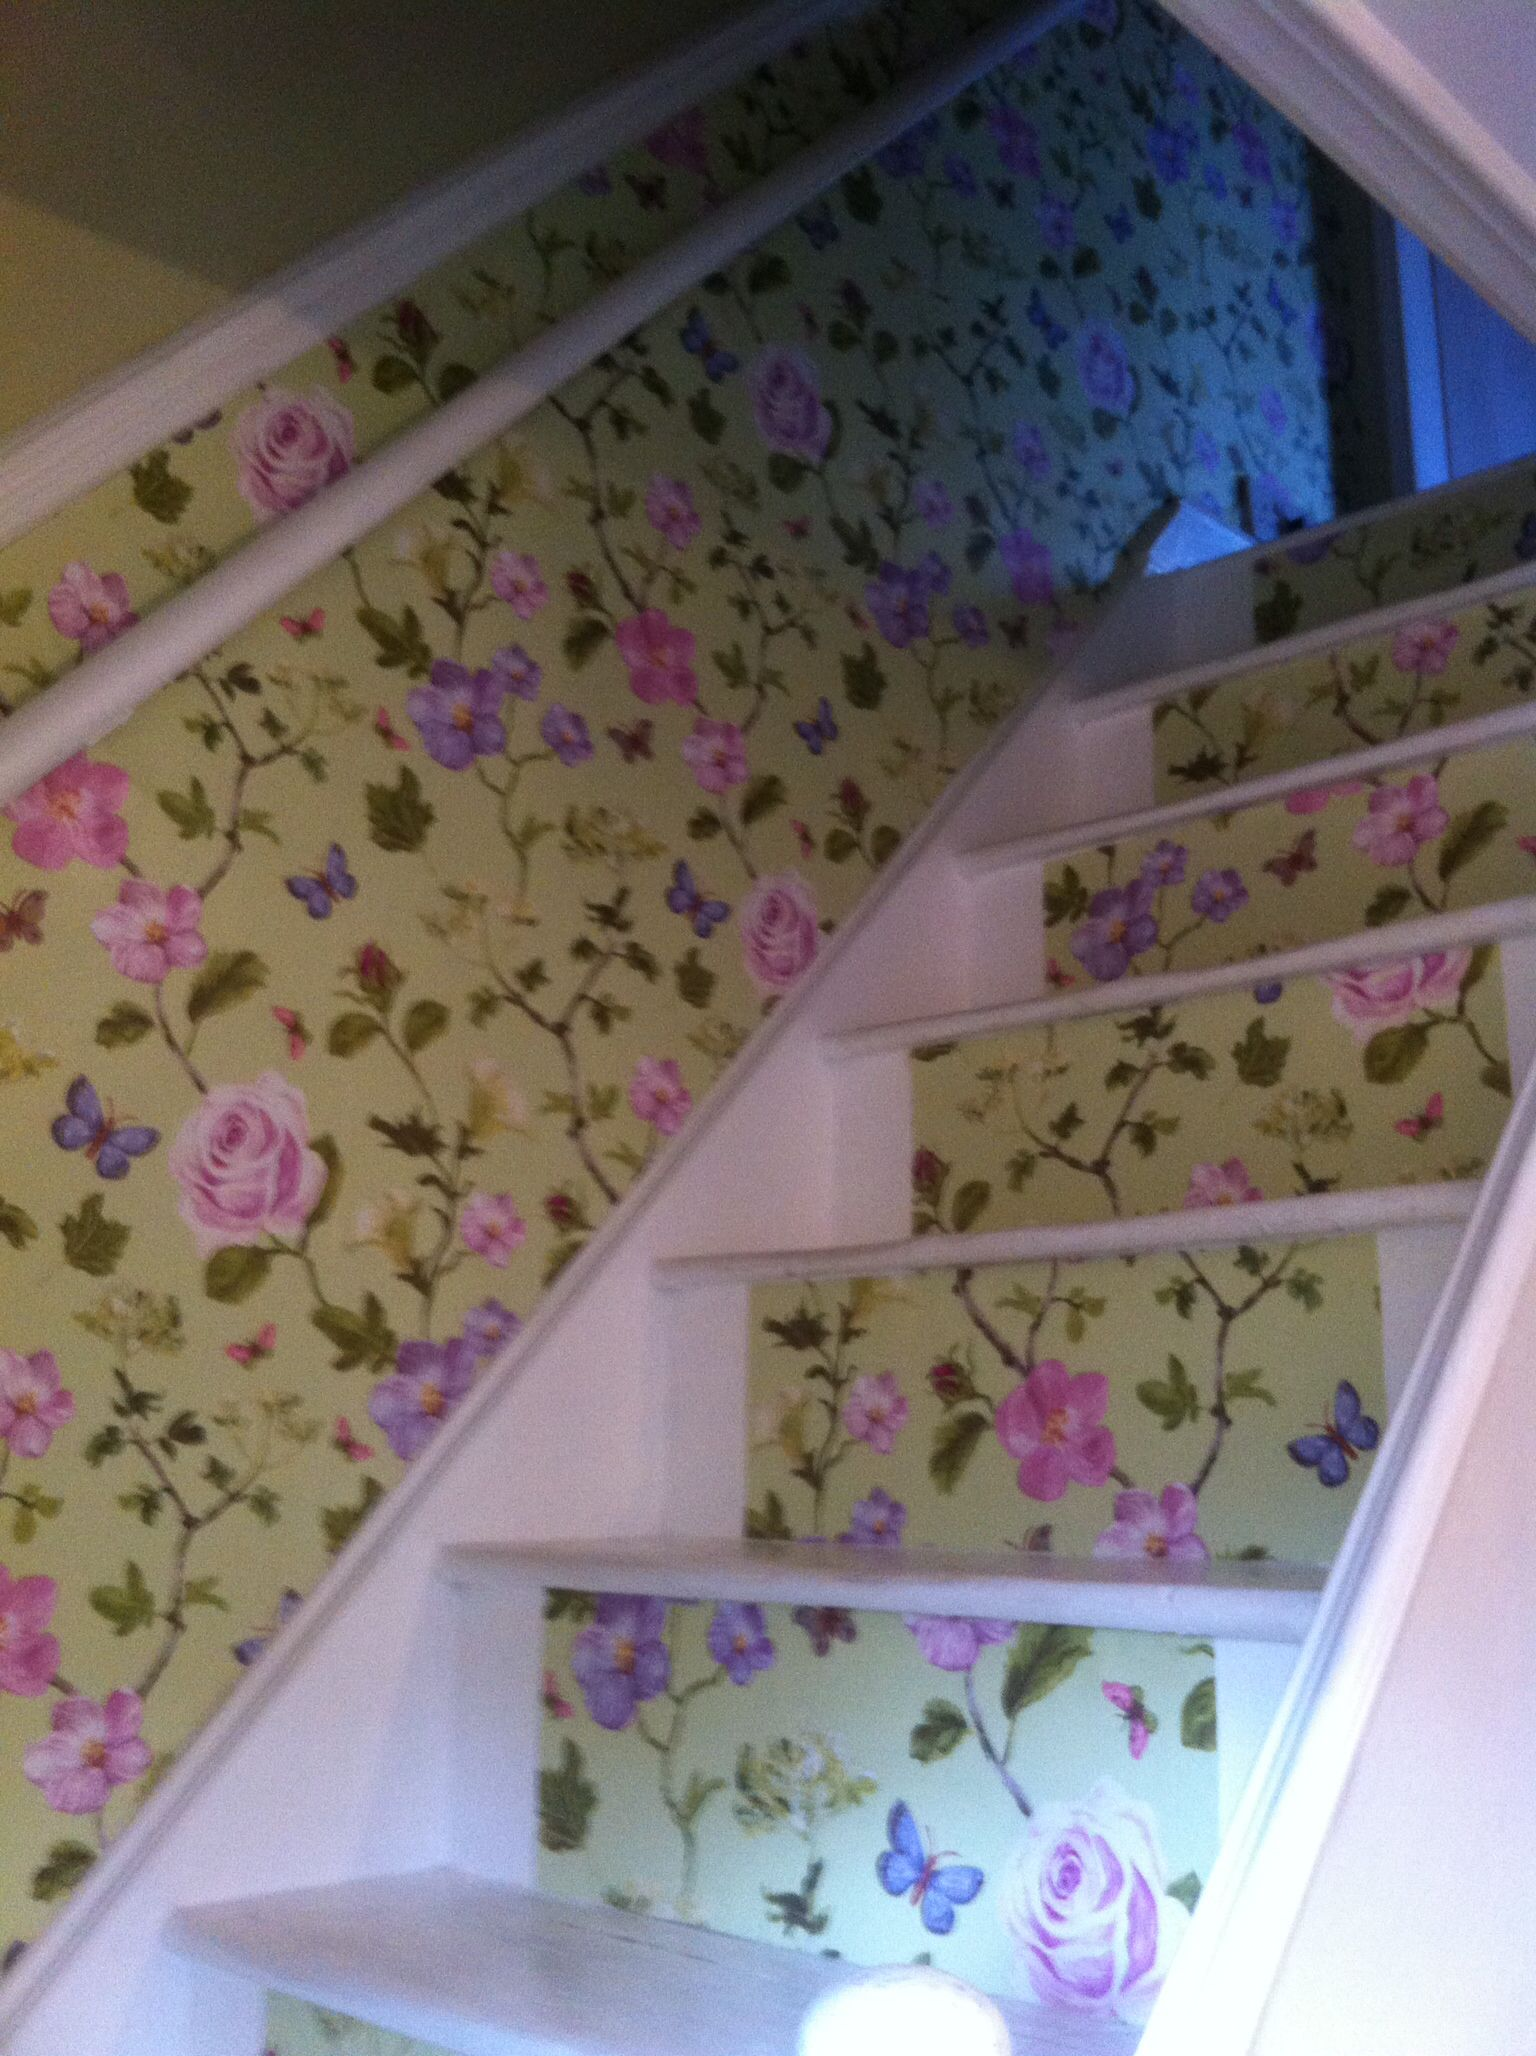 Hallway wallpaper dado rail  Eijffinger wallpaper used on stair risers and under dado rail to